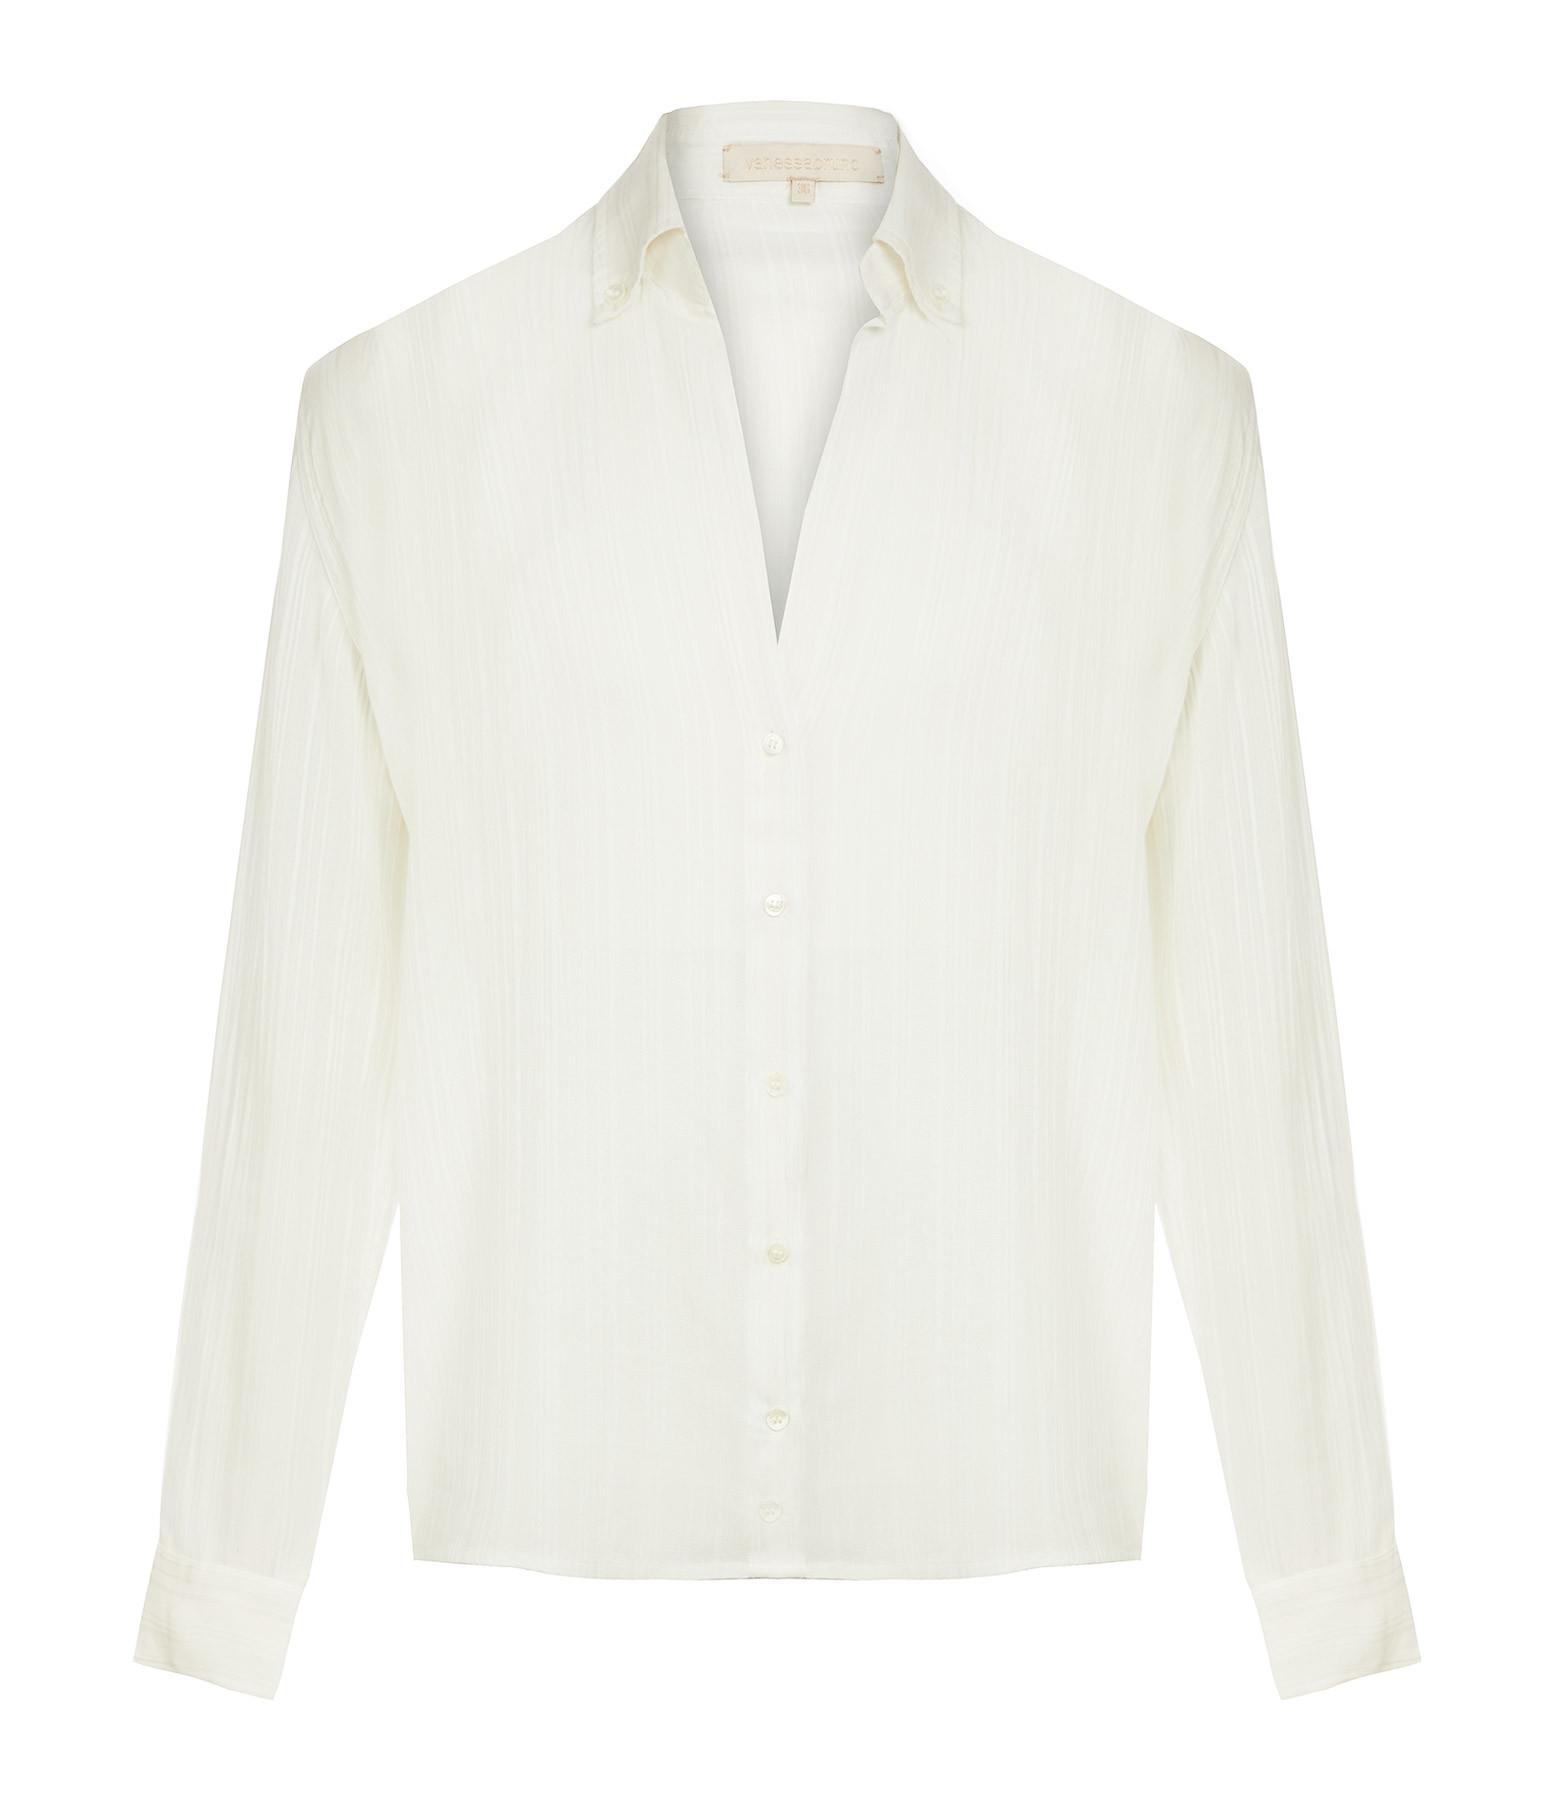 VANESSA BRUNO - Chemise Druyat Blanc